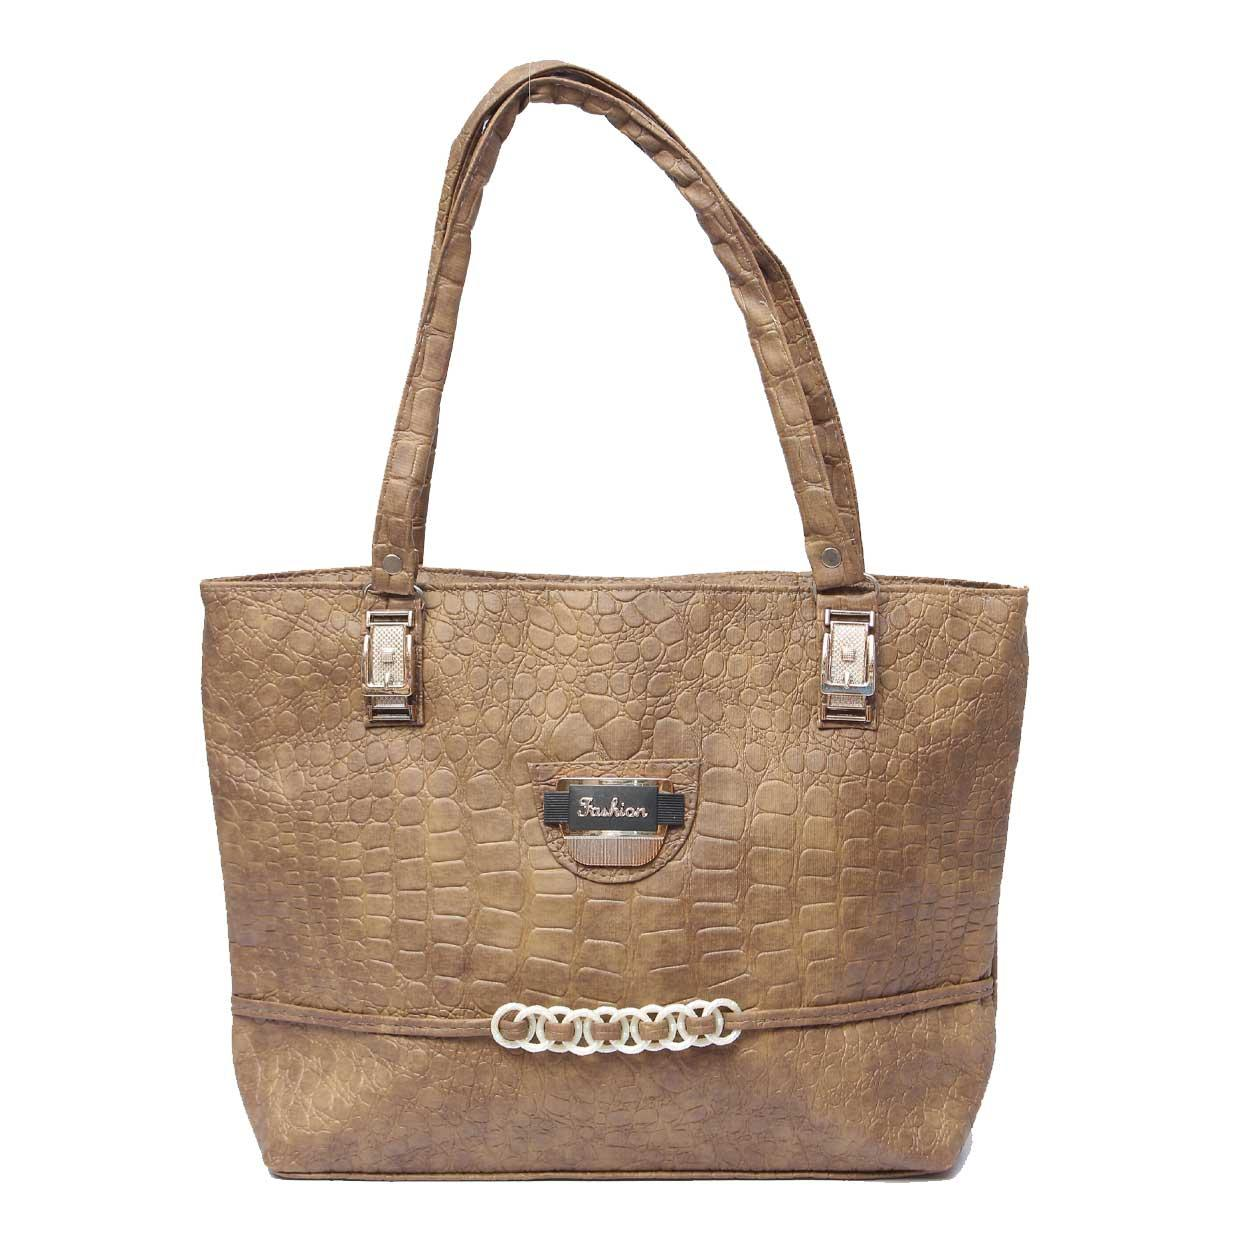 Buy Ladies shop Women Top-Handle Bags at Best Prices Online in ... adf152698f638